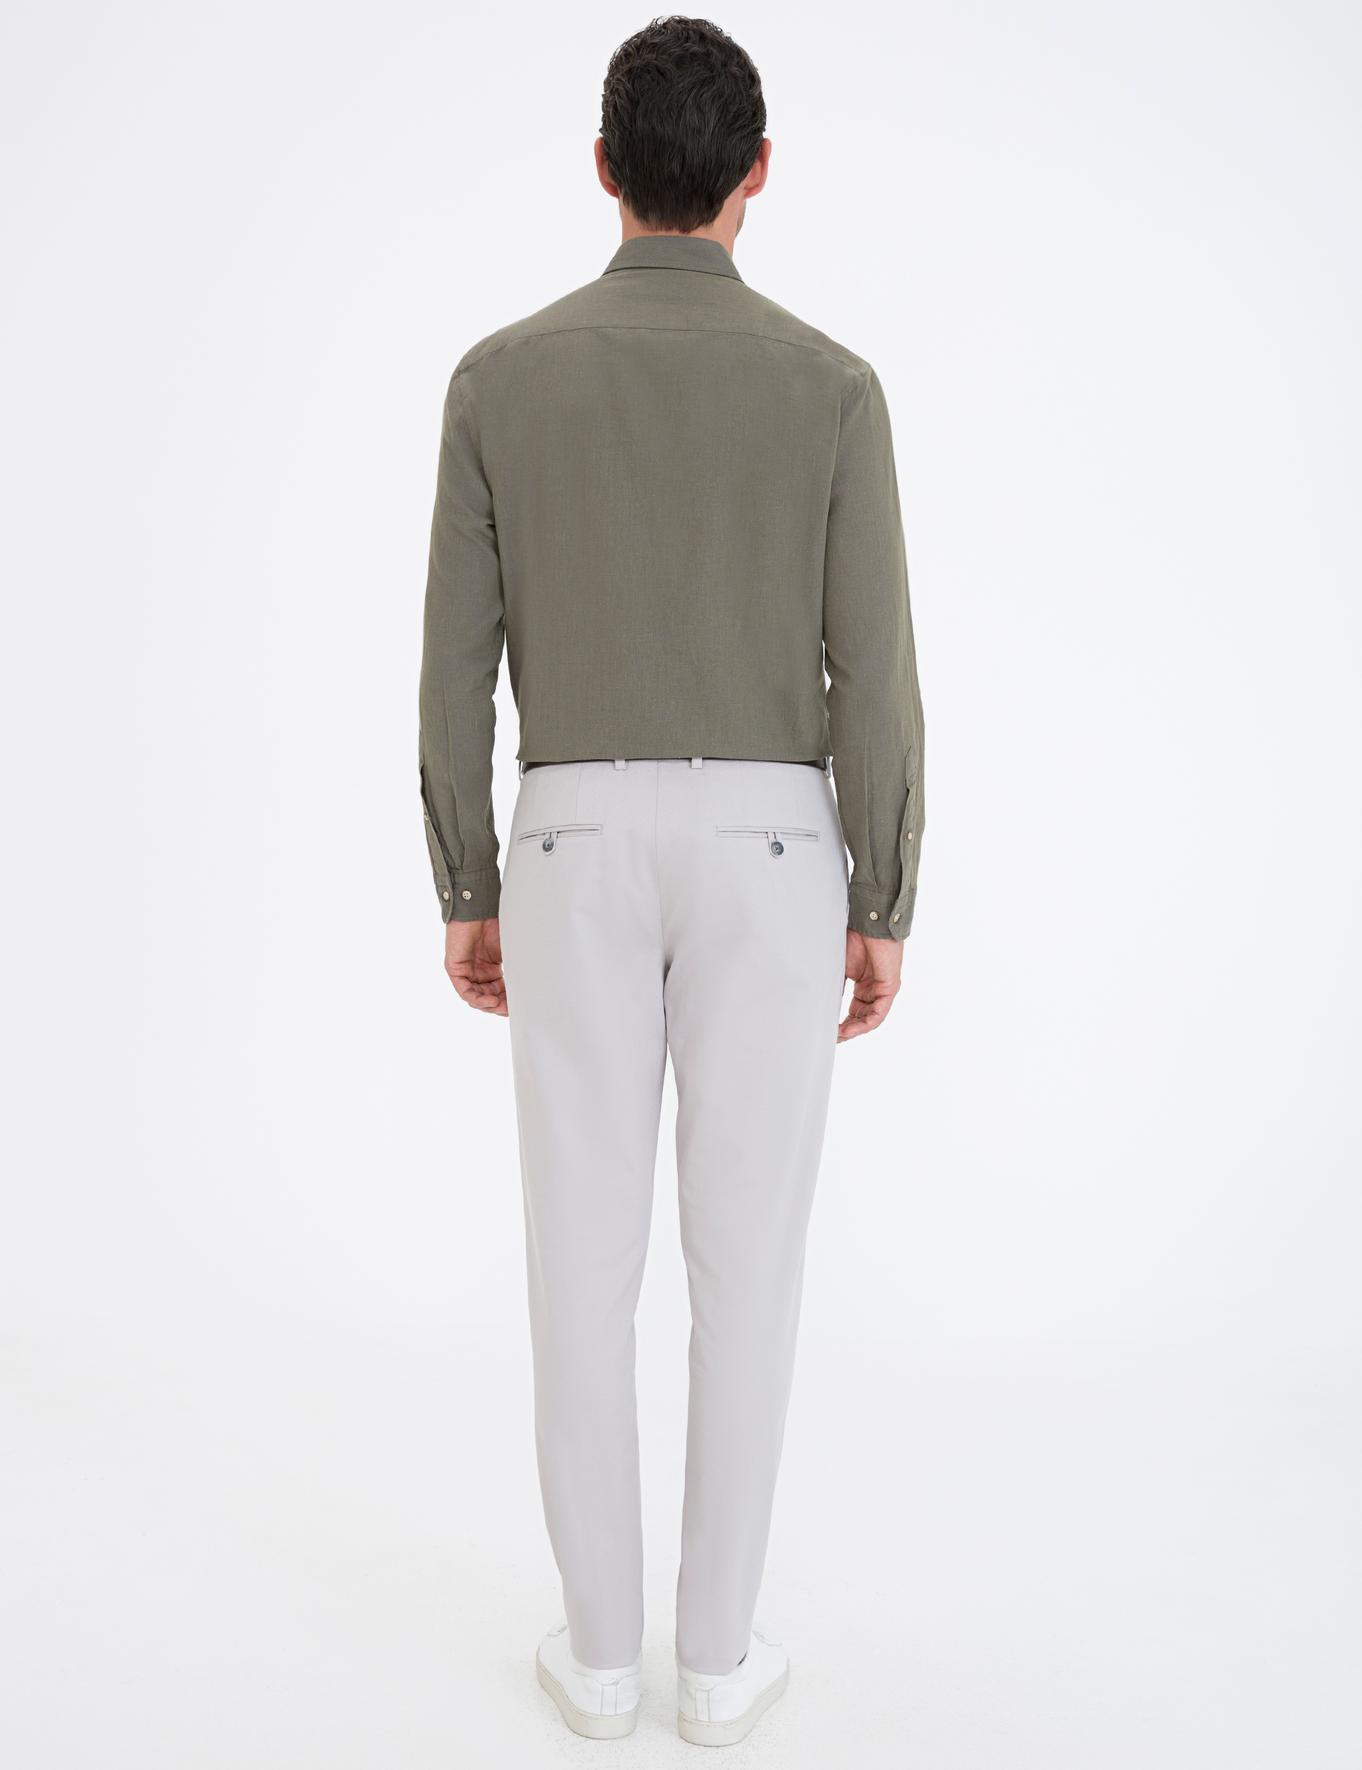 Taş Ekstra Slim Fit Pantolon